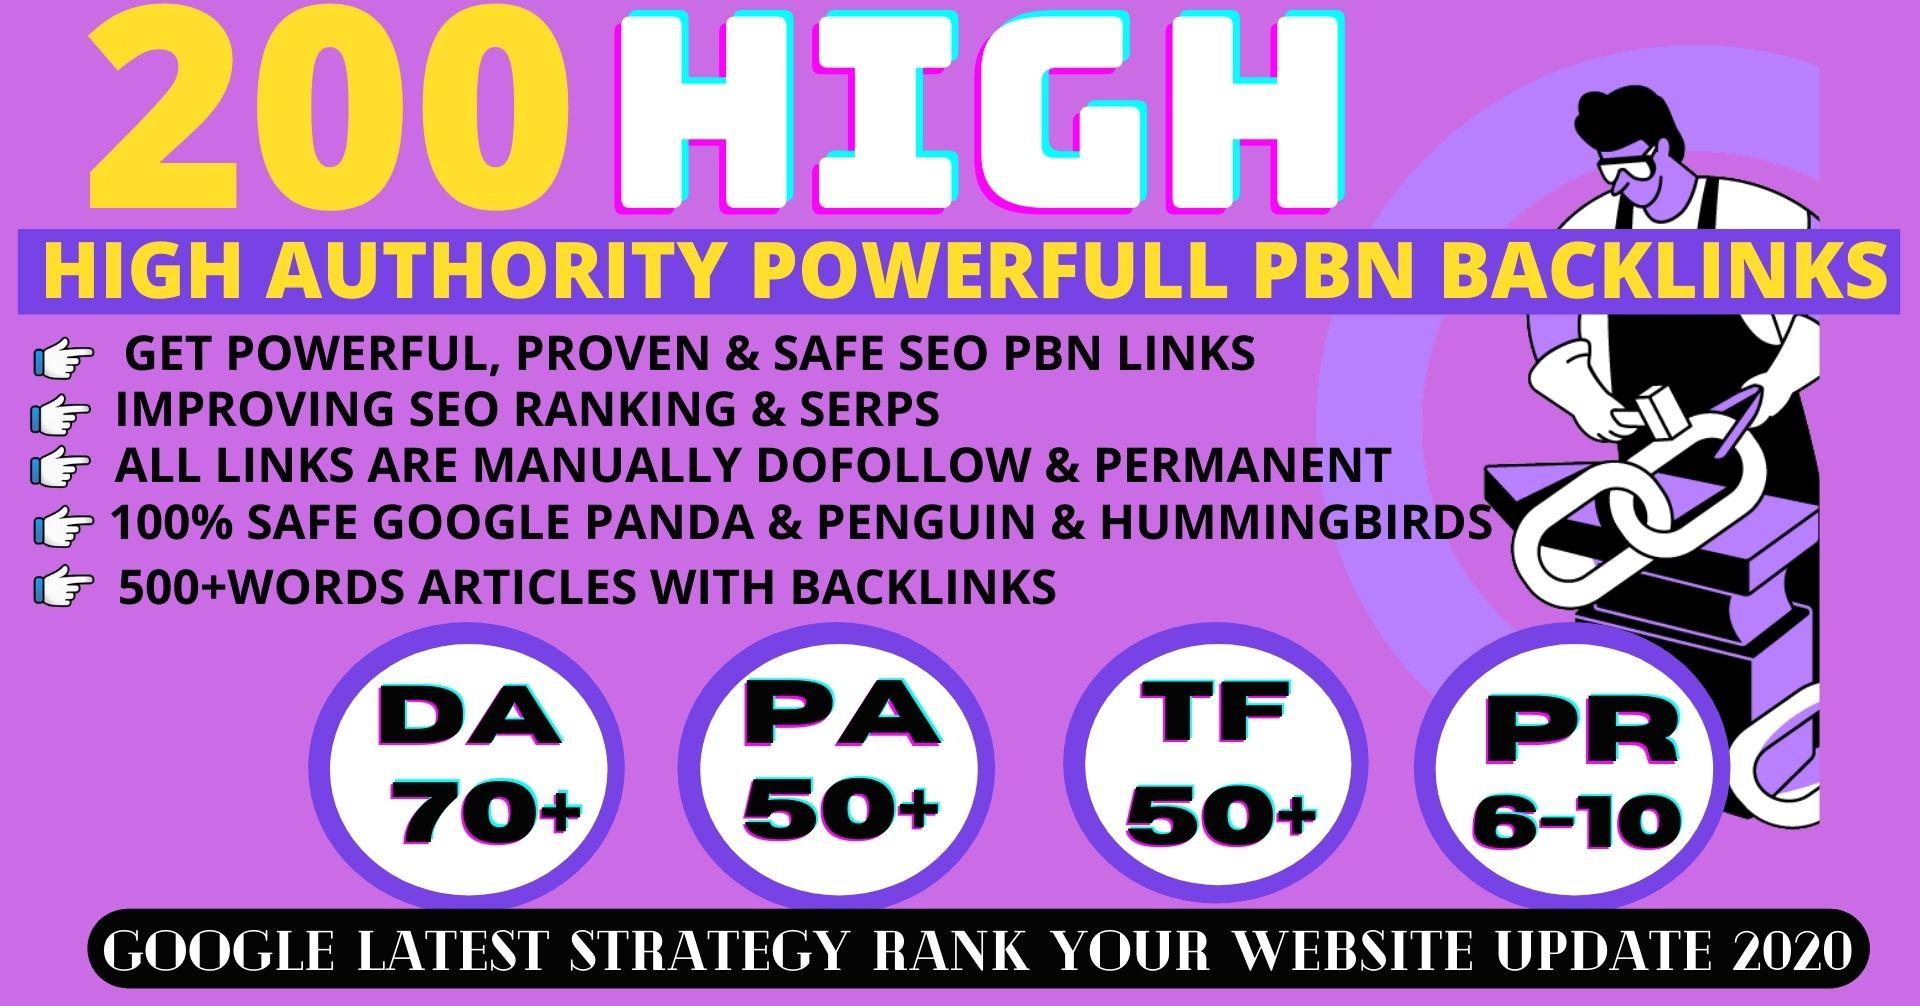 Build 200+ Permanent pbn backlinks DA70+ PA50+ PR6+ with web2.0 unique website